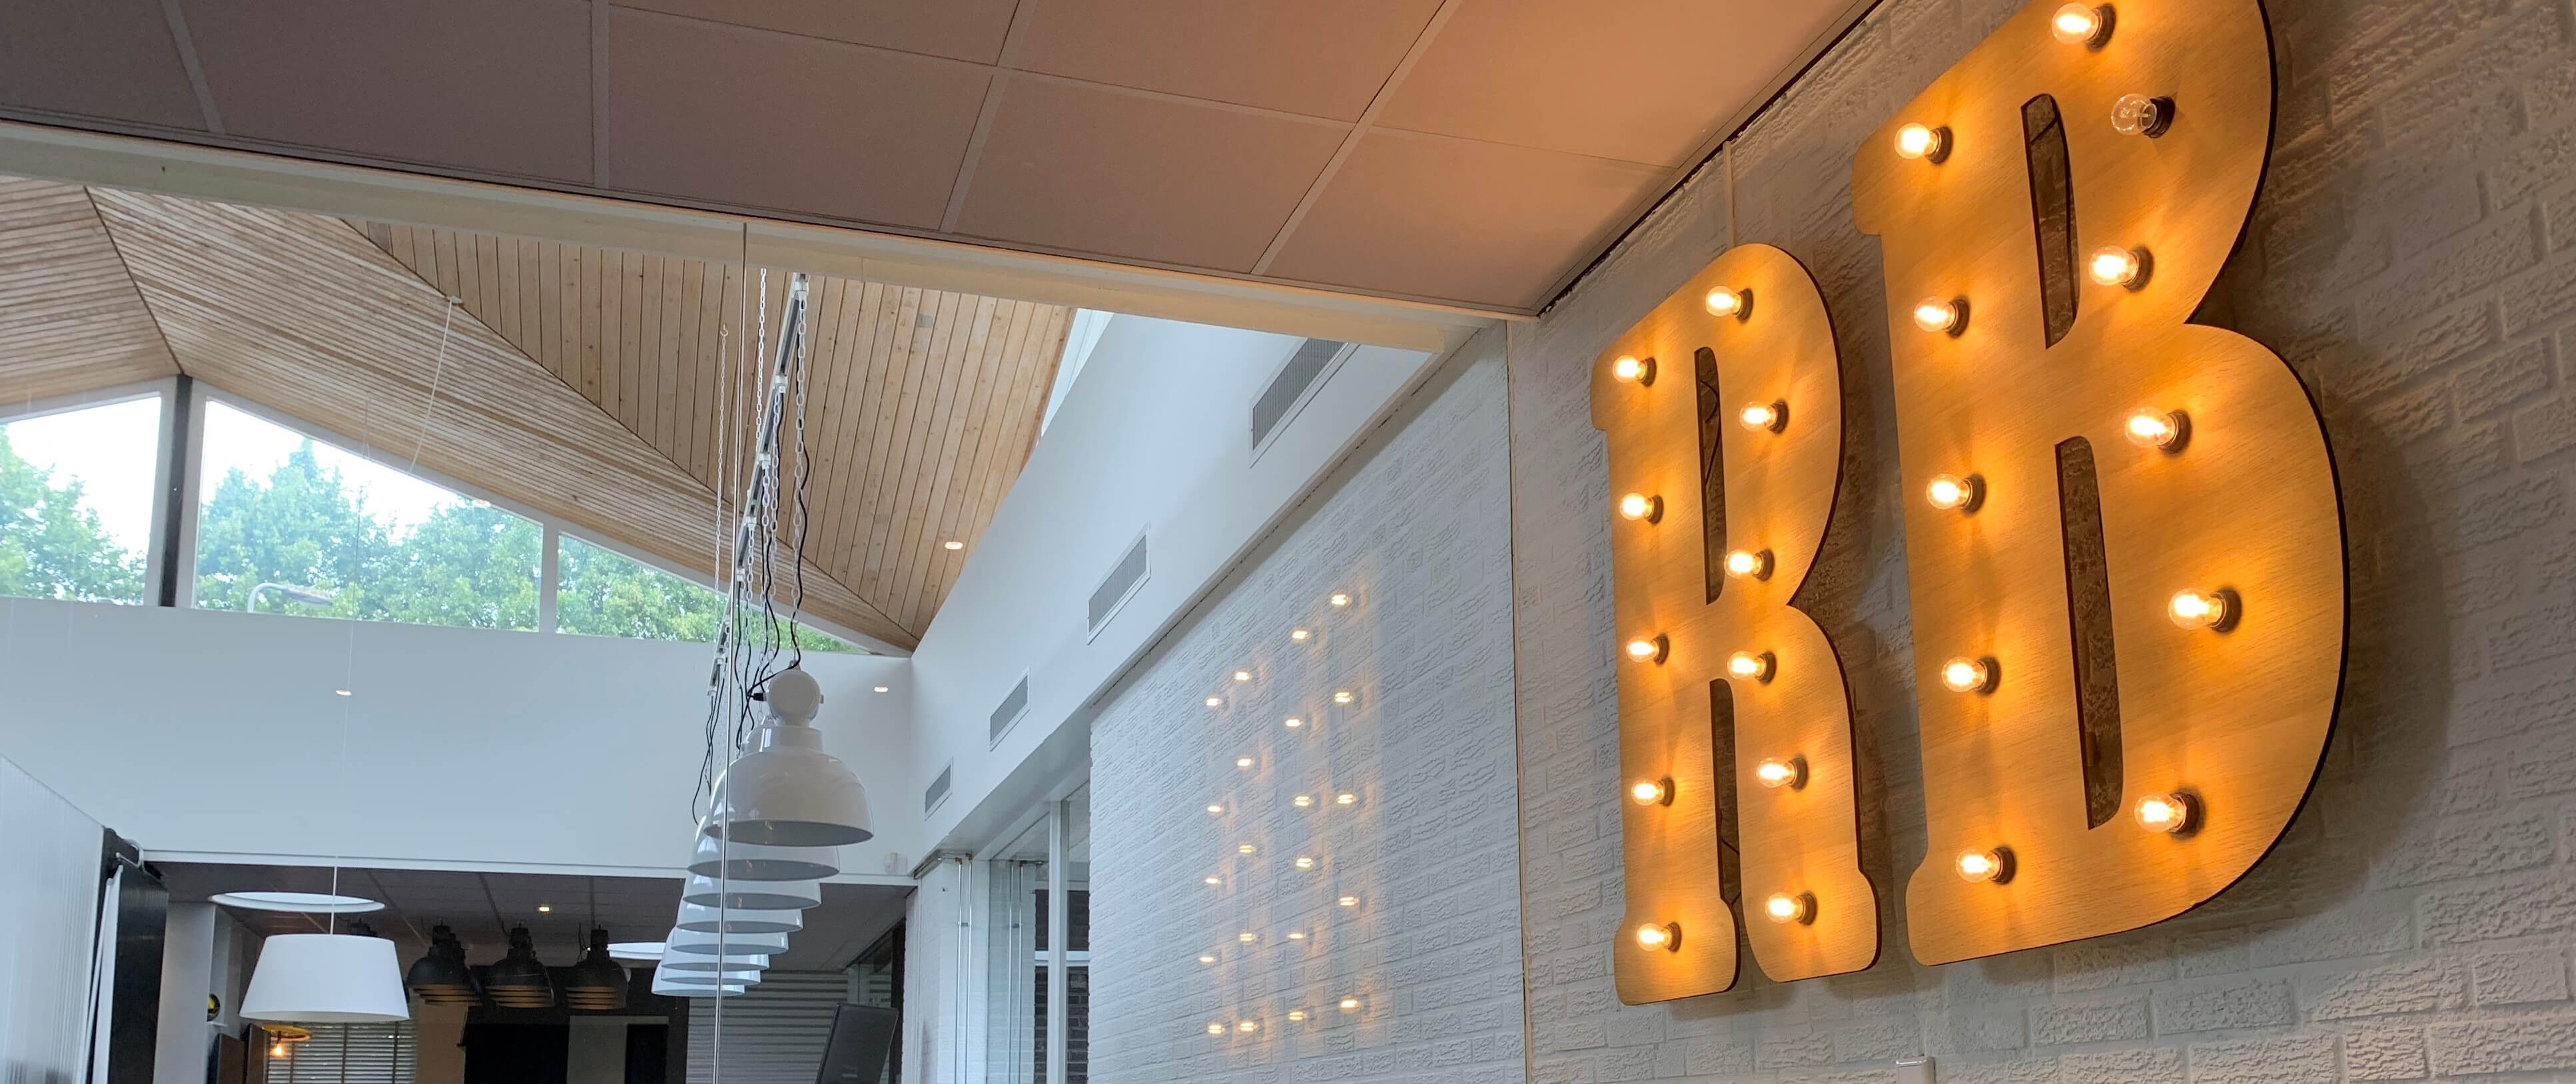 Online Marketing Bureau RB-Media Breda